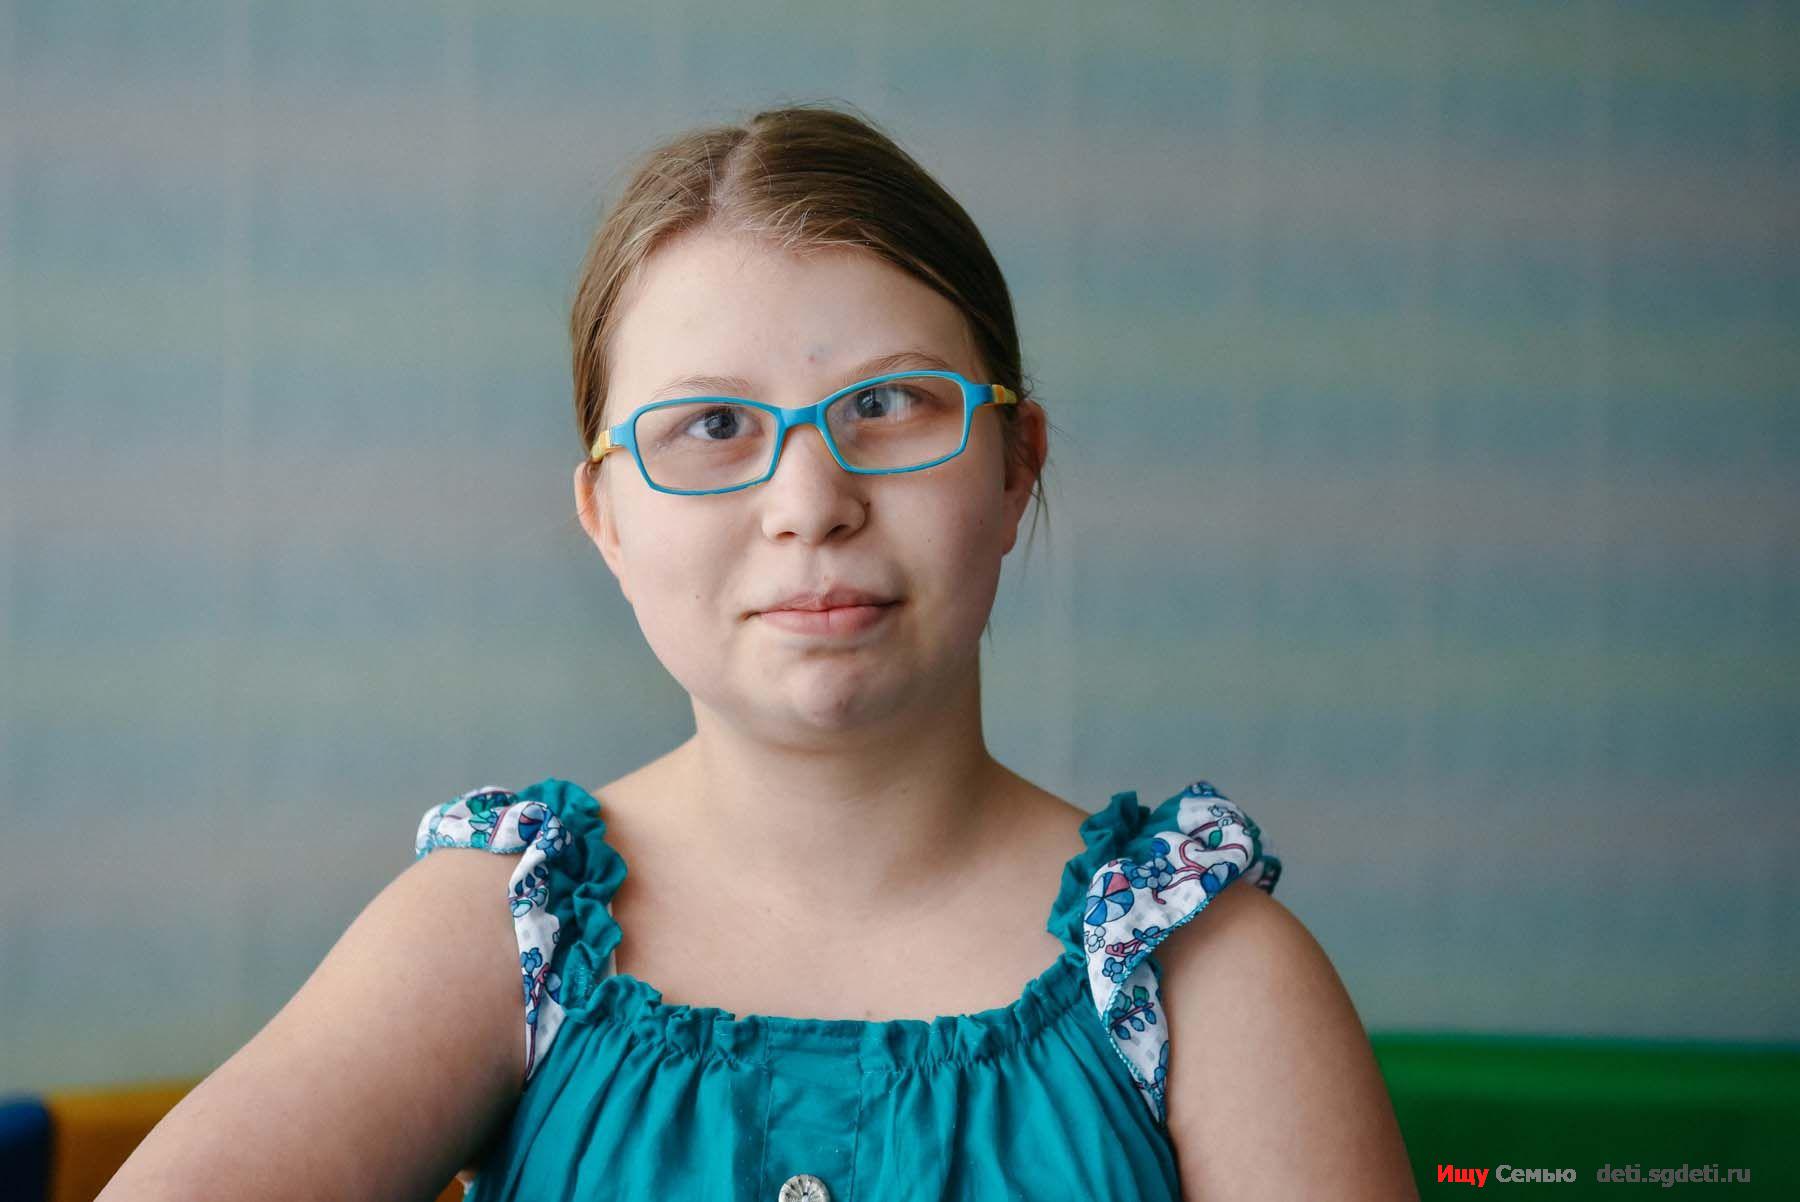 Эльвина Б. ищет семью